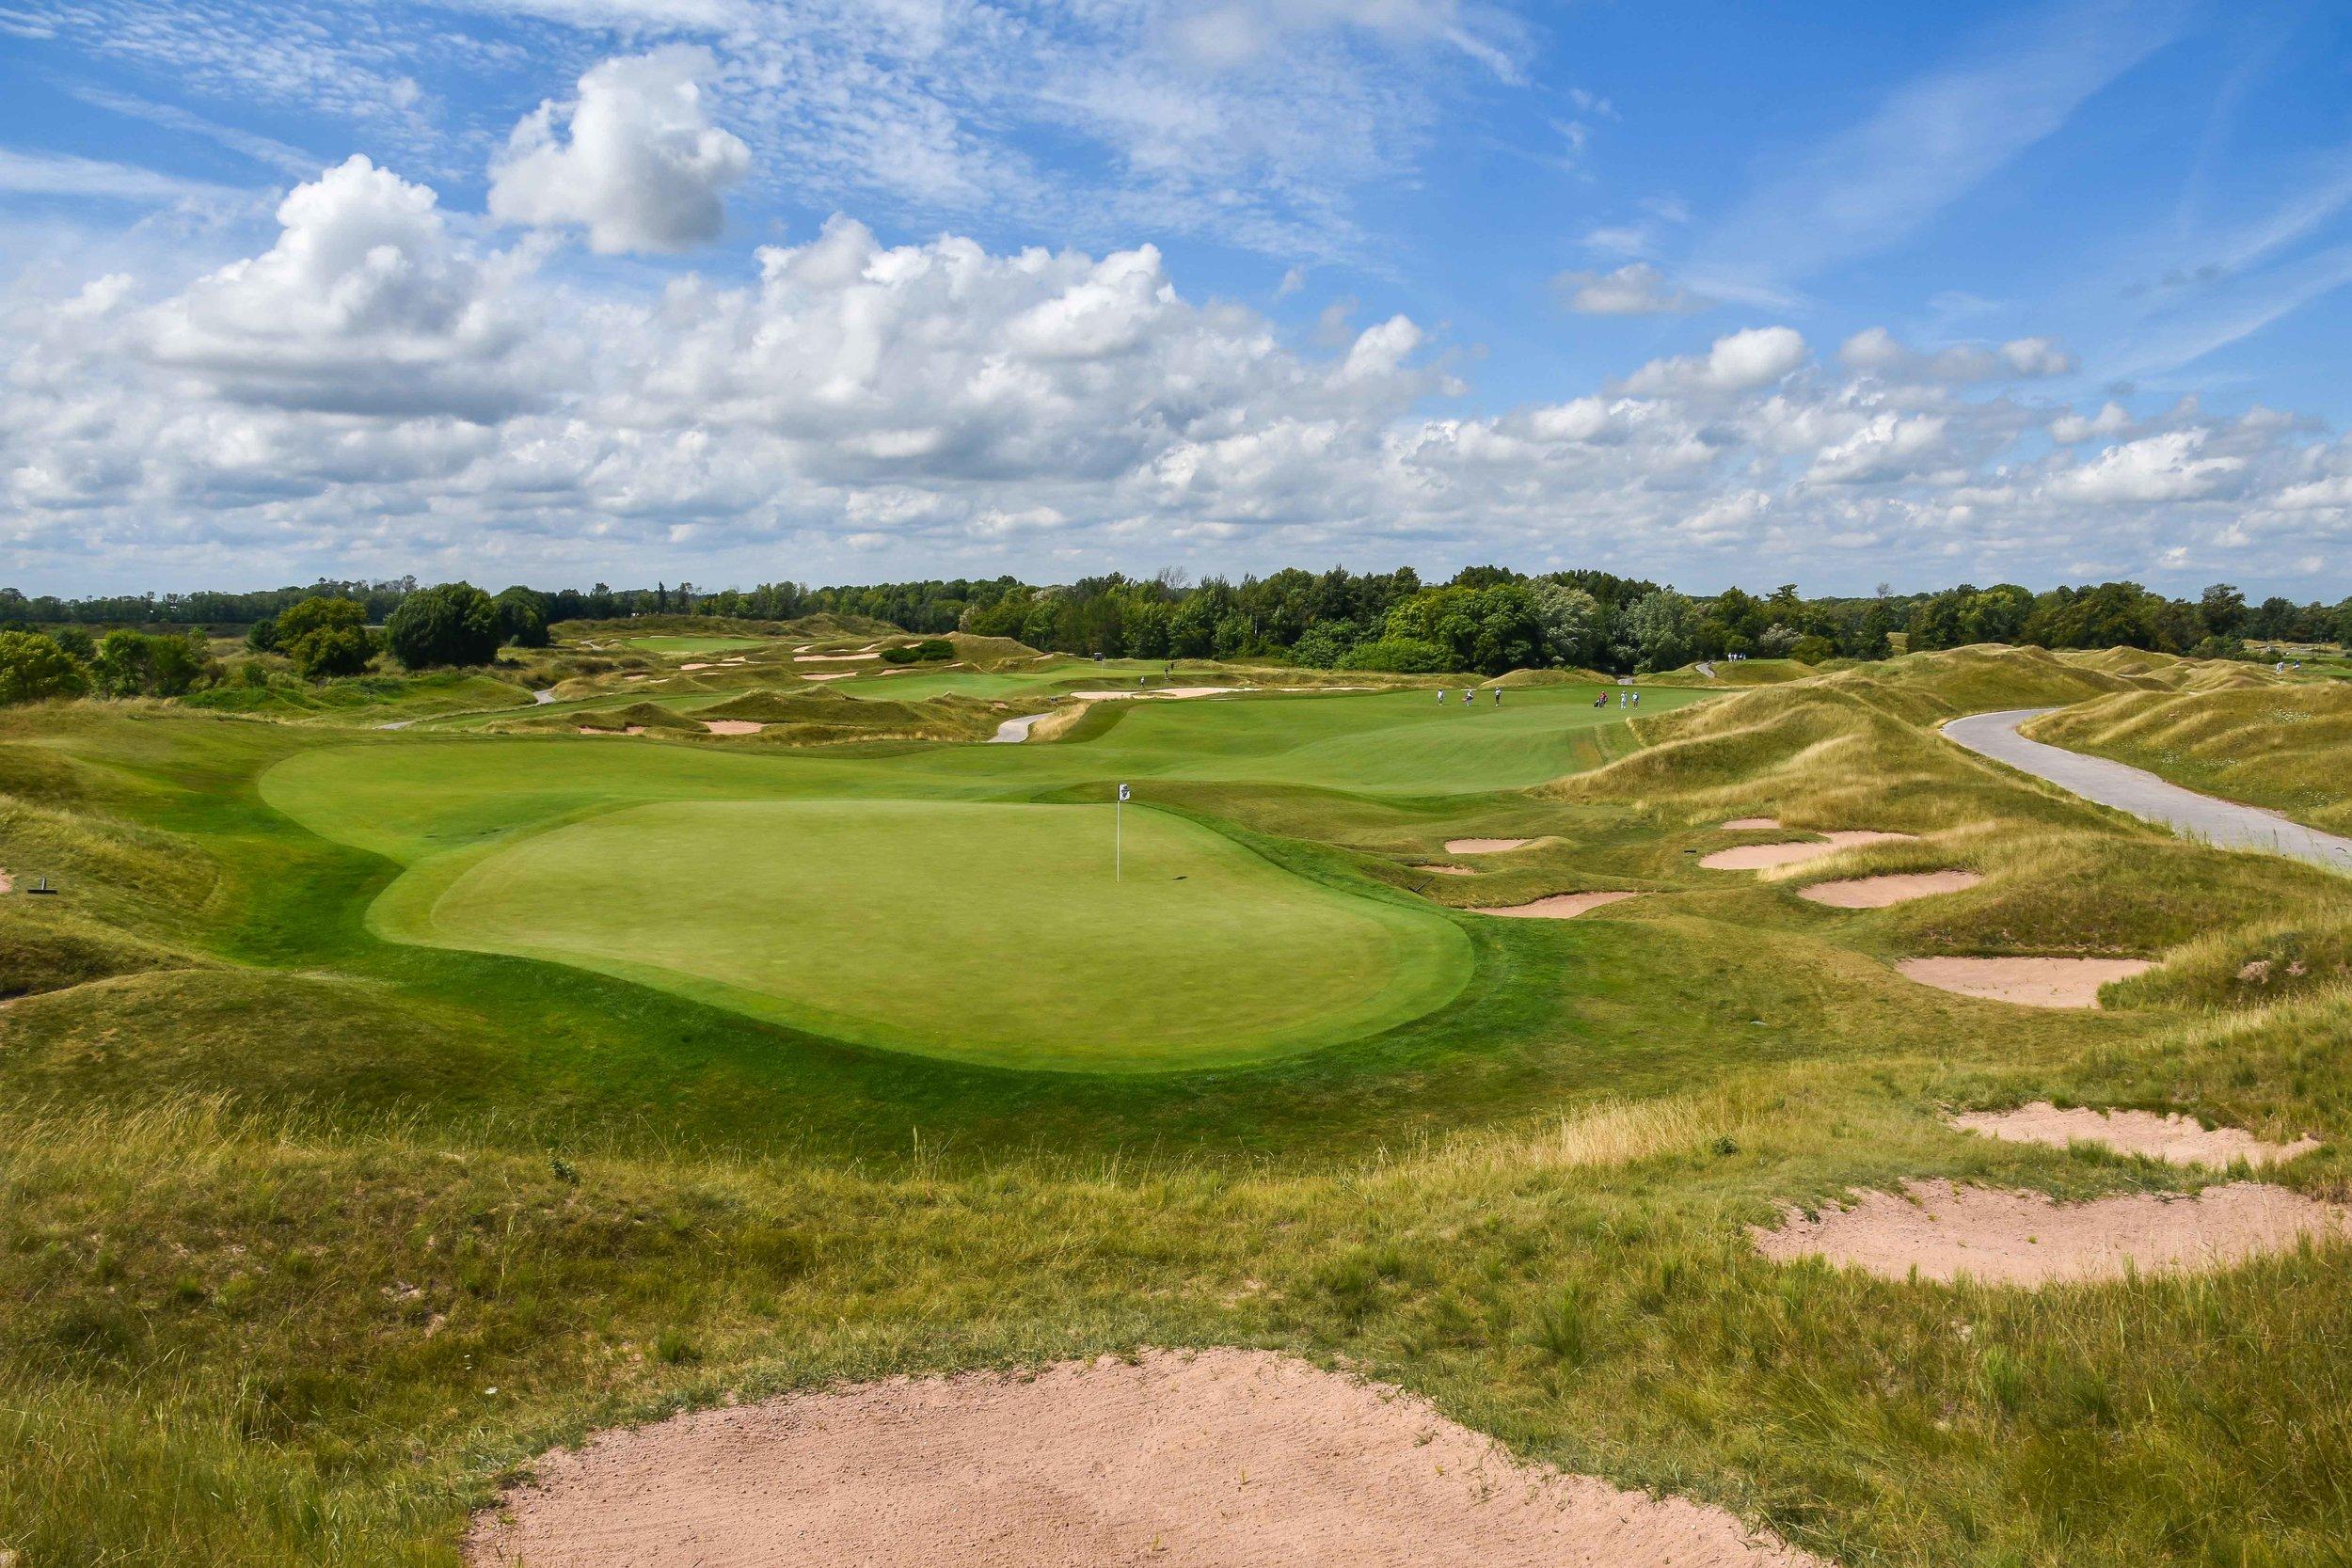 The opening hole on the Irish course.